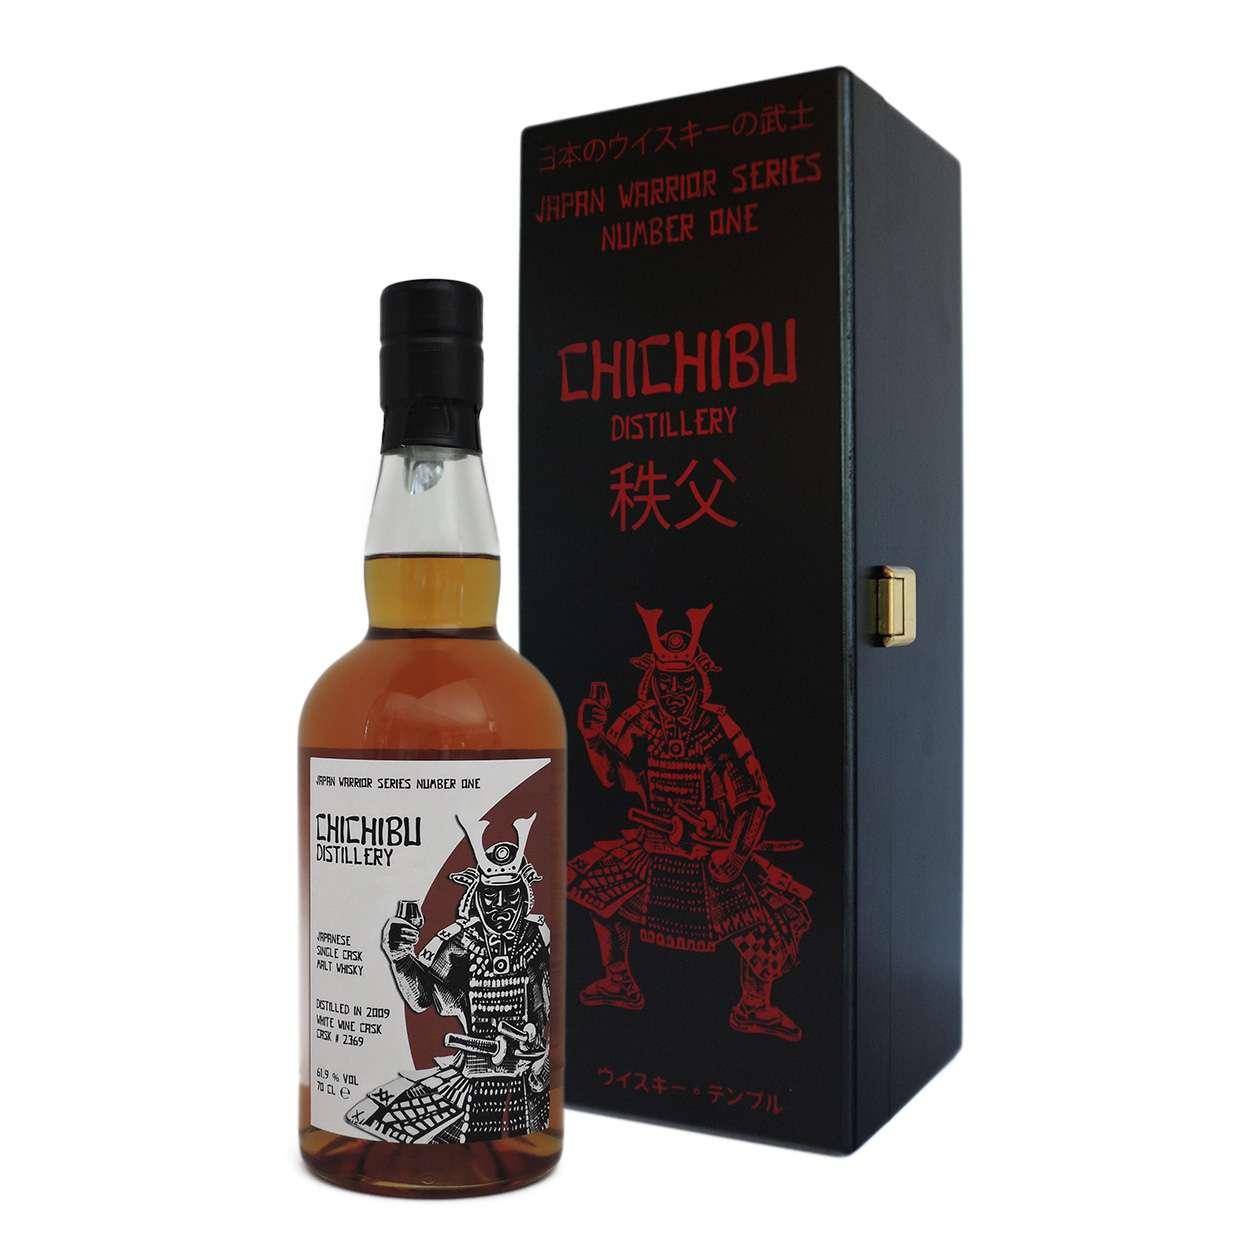 Japan Warrior Series Number One Chichibu Distillery Cask 2369 61